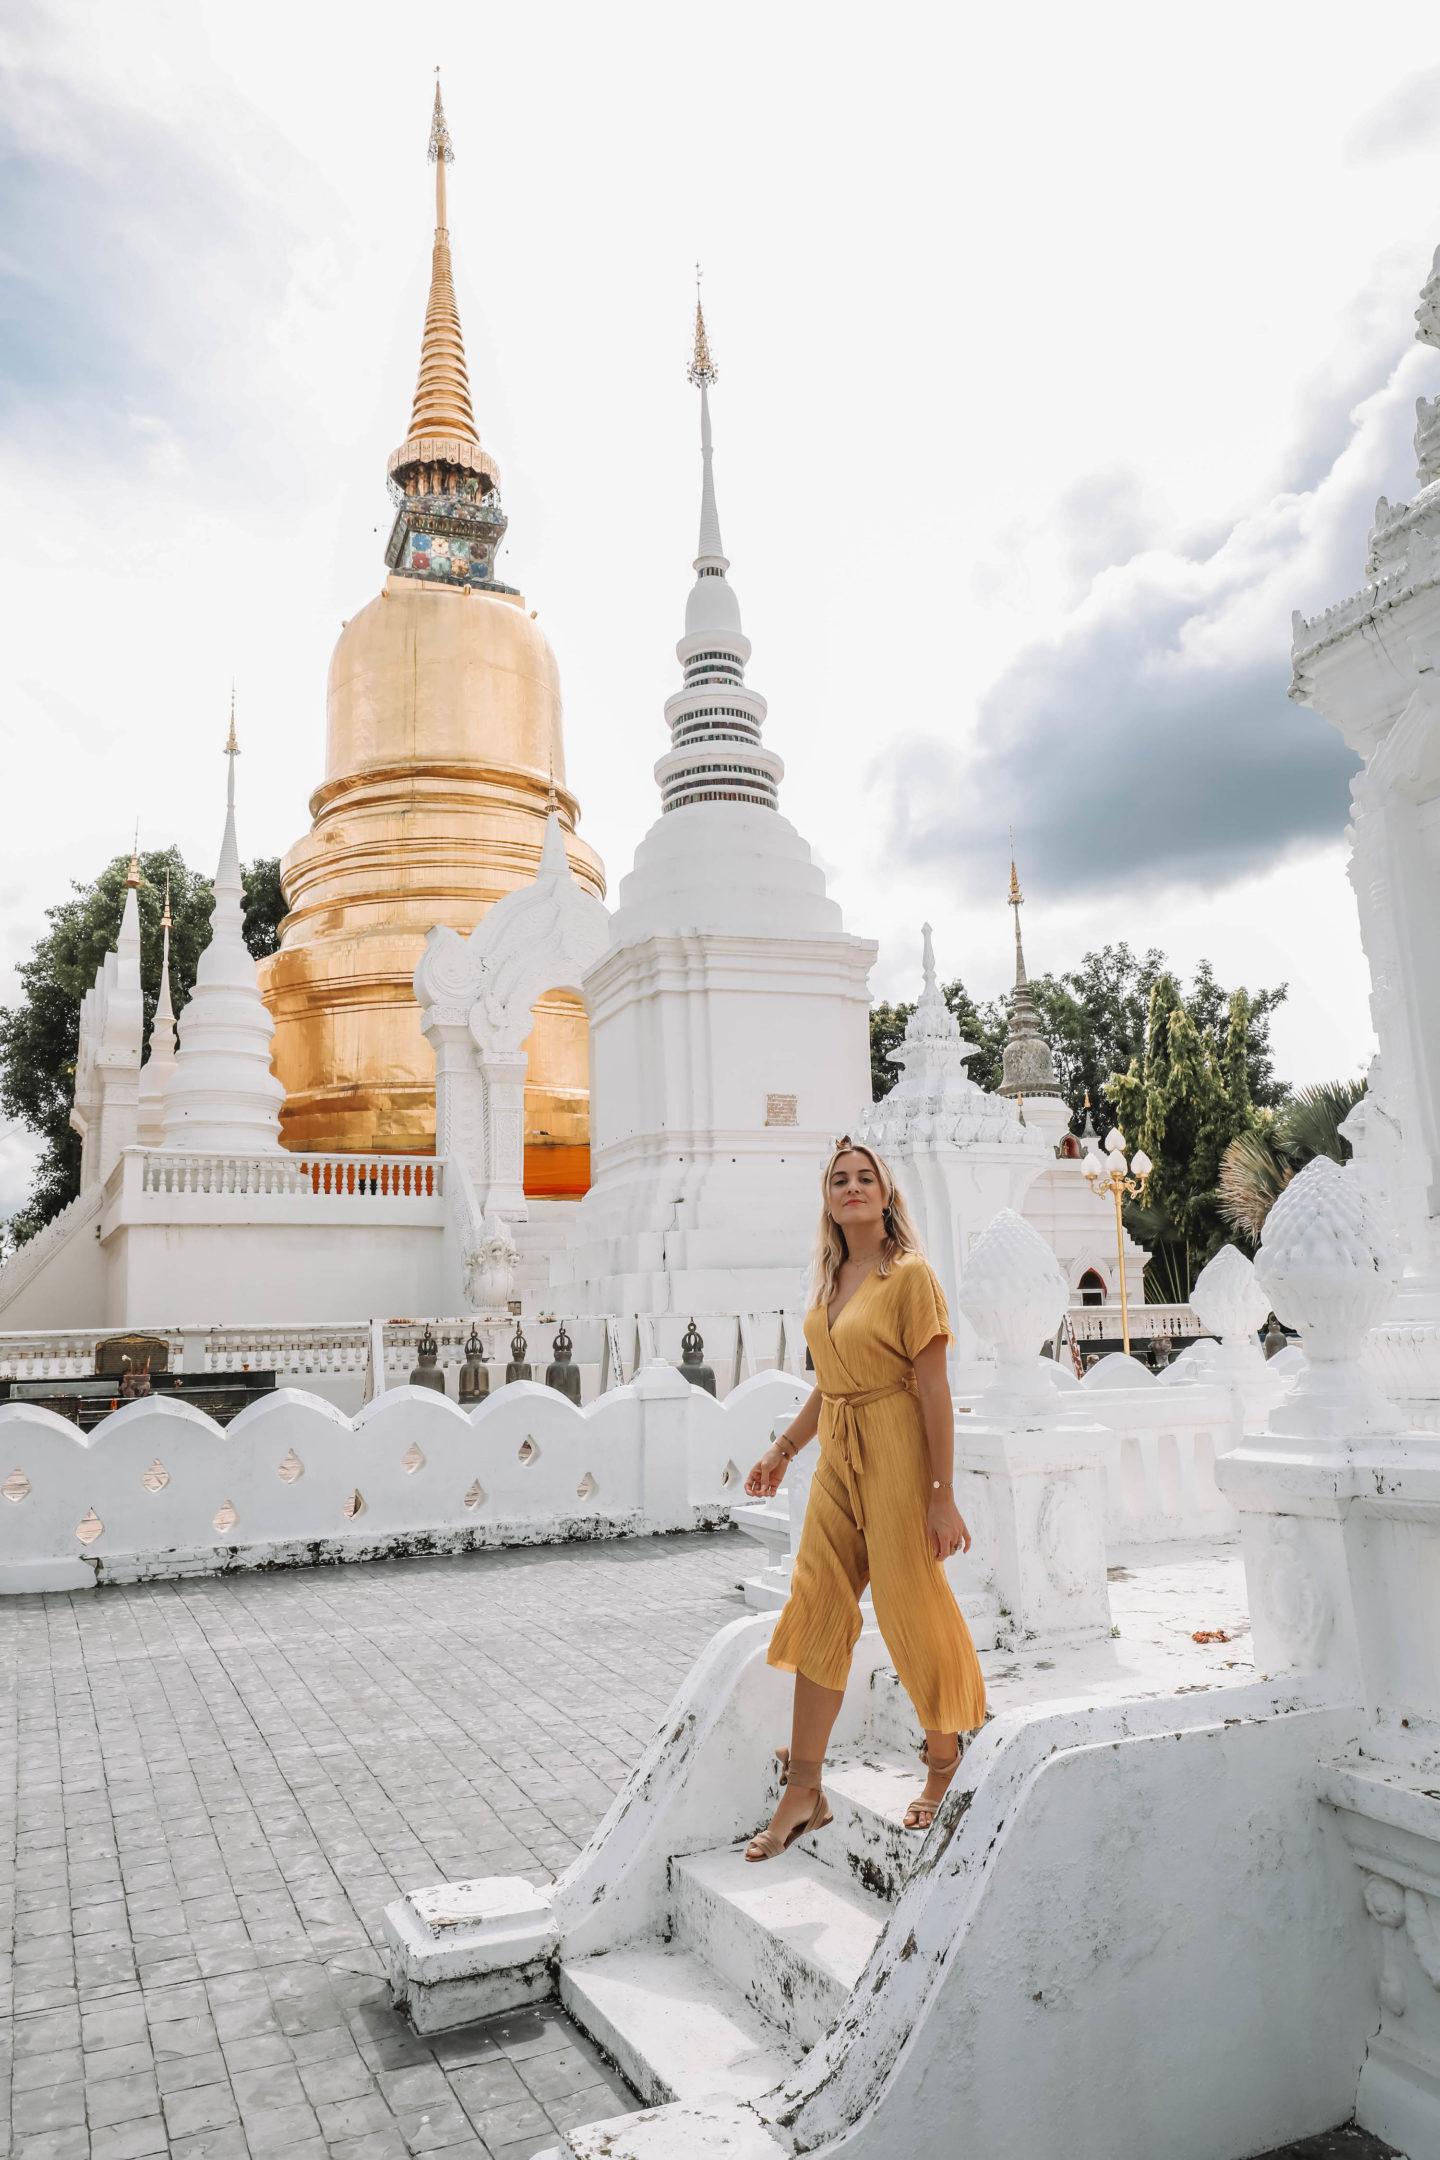 Temple Wat Suan Dok Chiang Mai - Blondie Baby blog mode et voyages